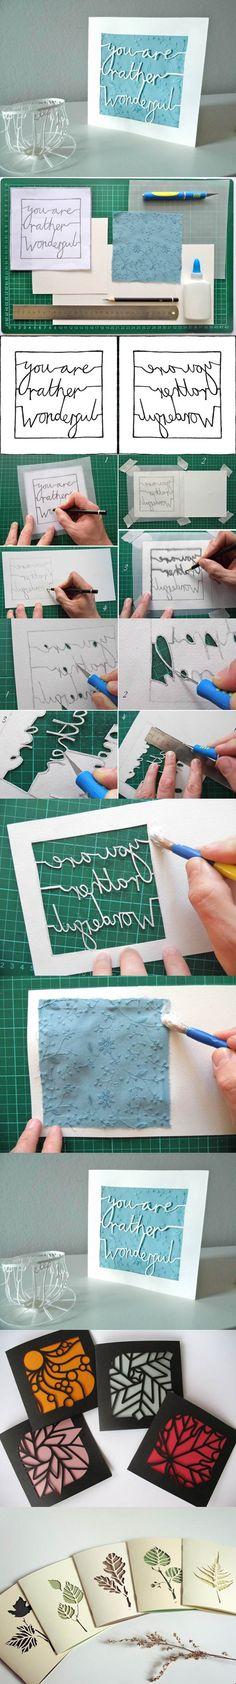 DIY Simple Kirigami Greeting Card | iCreativeIdeas.com Like Us on Facebook ==> https://www.facebook.com/icreativeideas